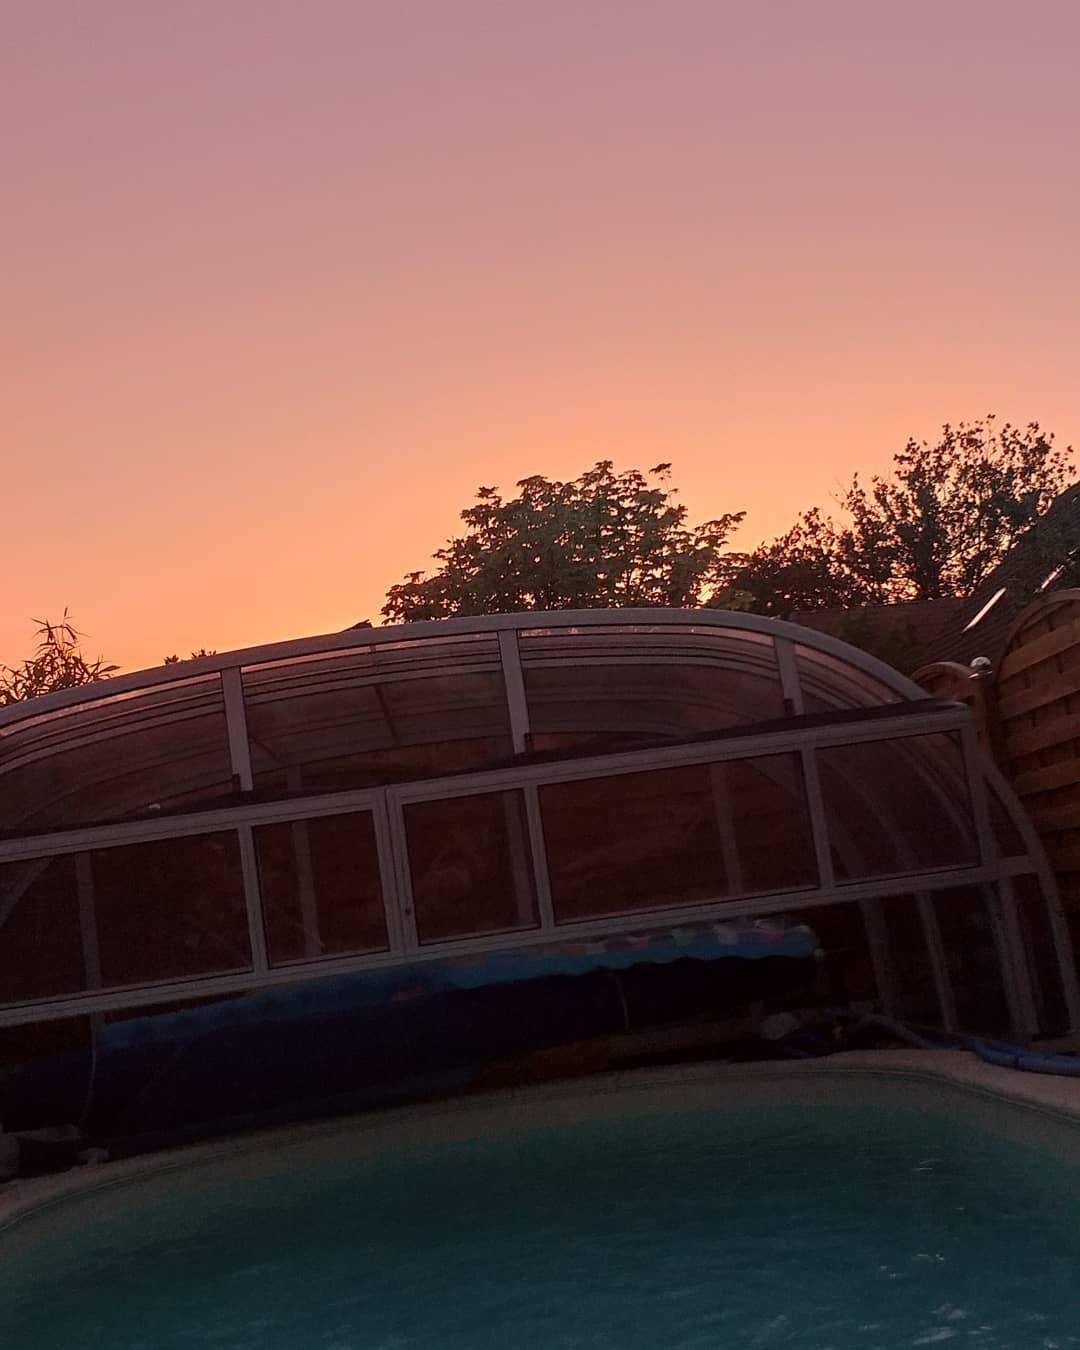 Pool Himmel Pooltime Poolhaus Gartenideen Garten Sommer Summer Sun Gartenliege Poolloung Garten Ideen Garten Gartenliege